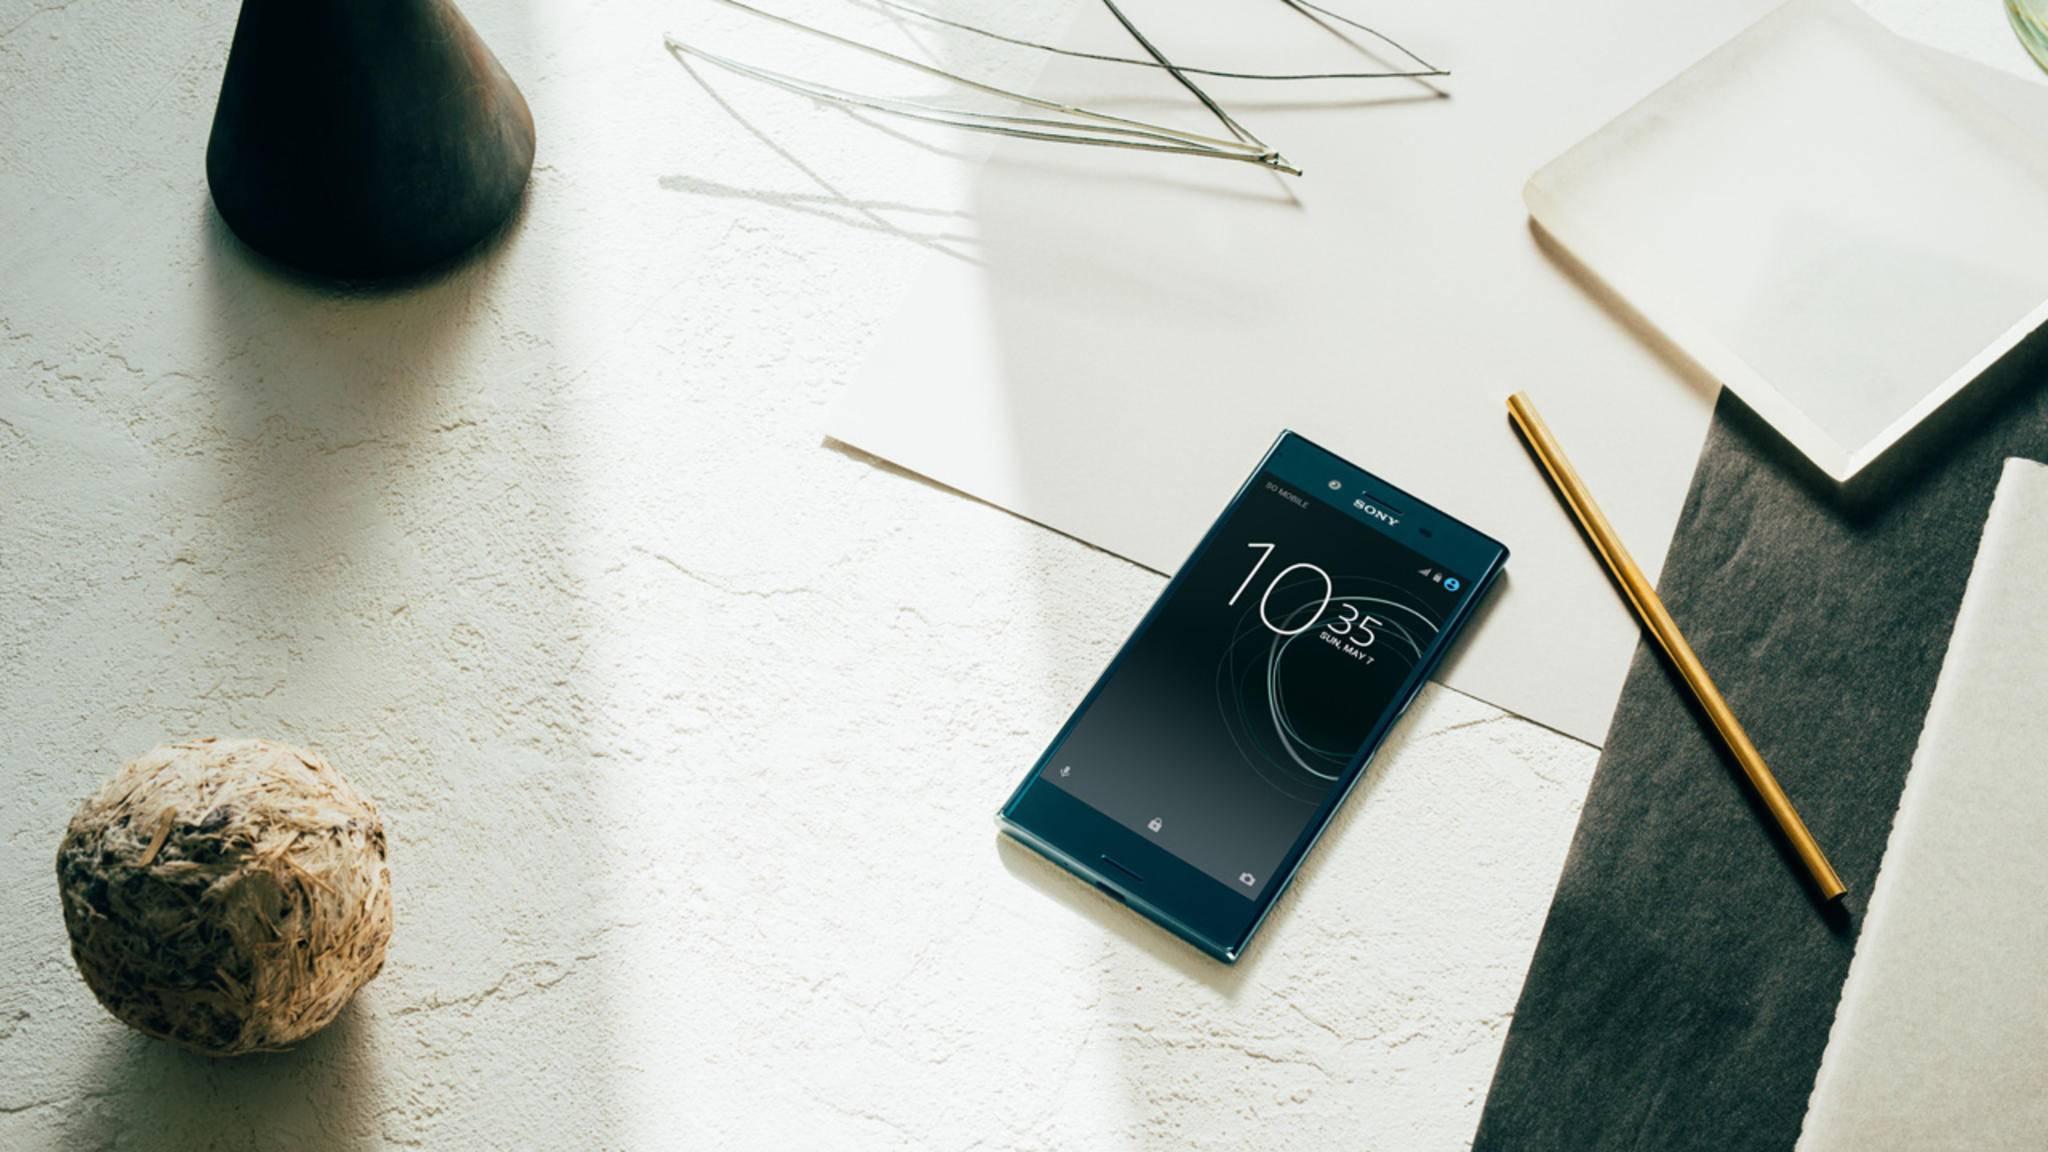 Mit Android 8.0 Oreo erhält das Xperia XZ Premium bald neue Features.